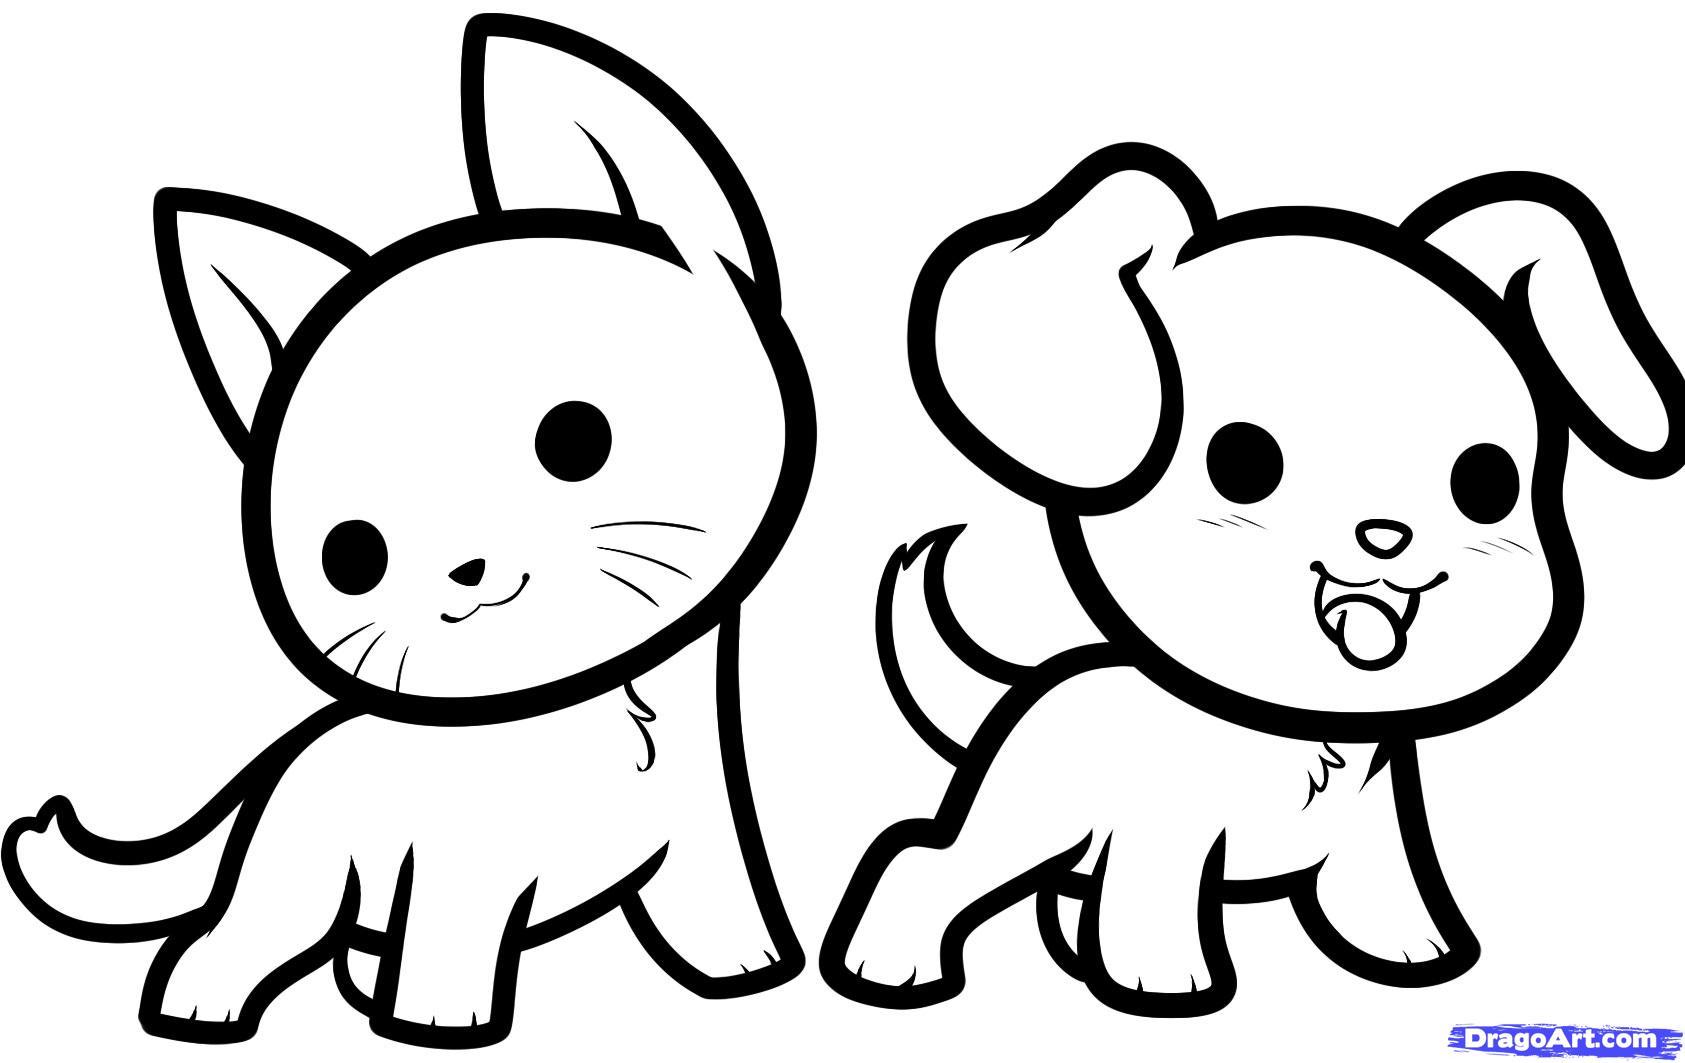 1685x1063 How To Draw A Panda Face Drawn Panda Realistic